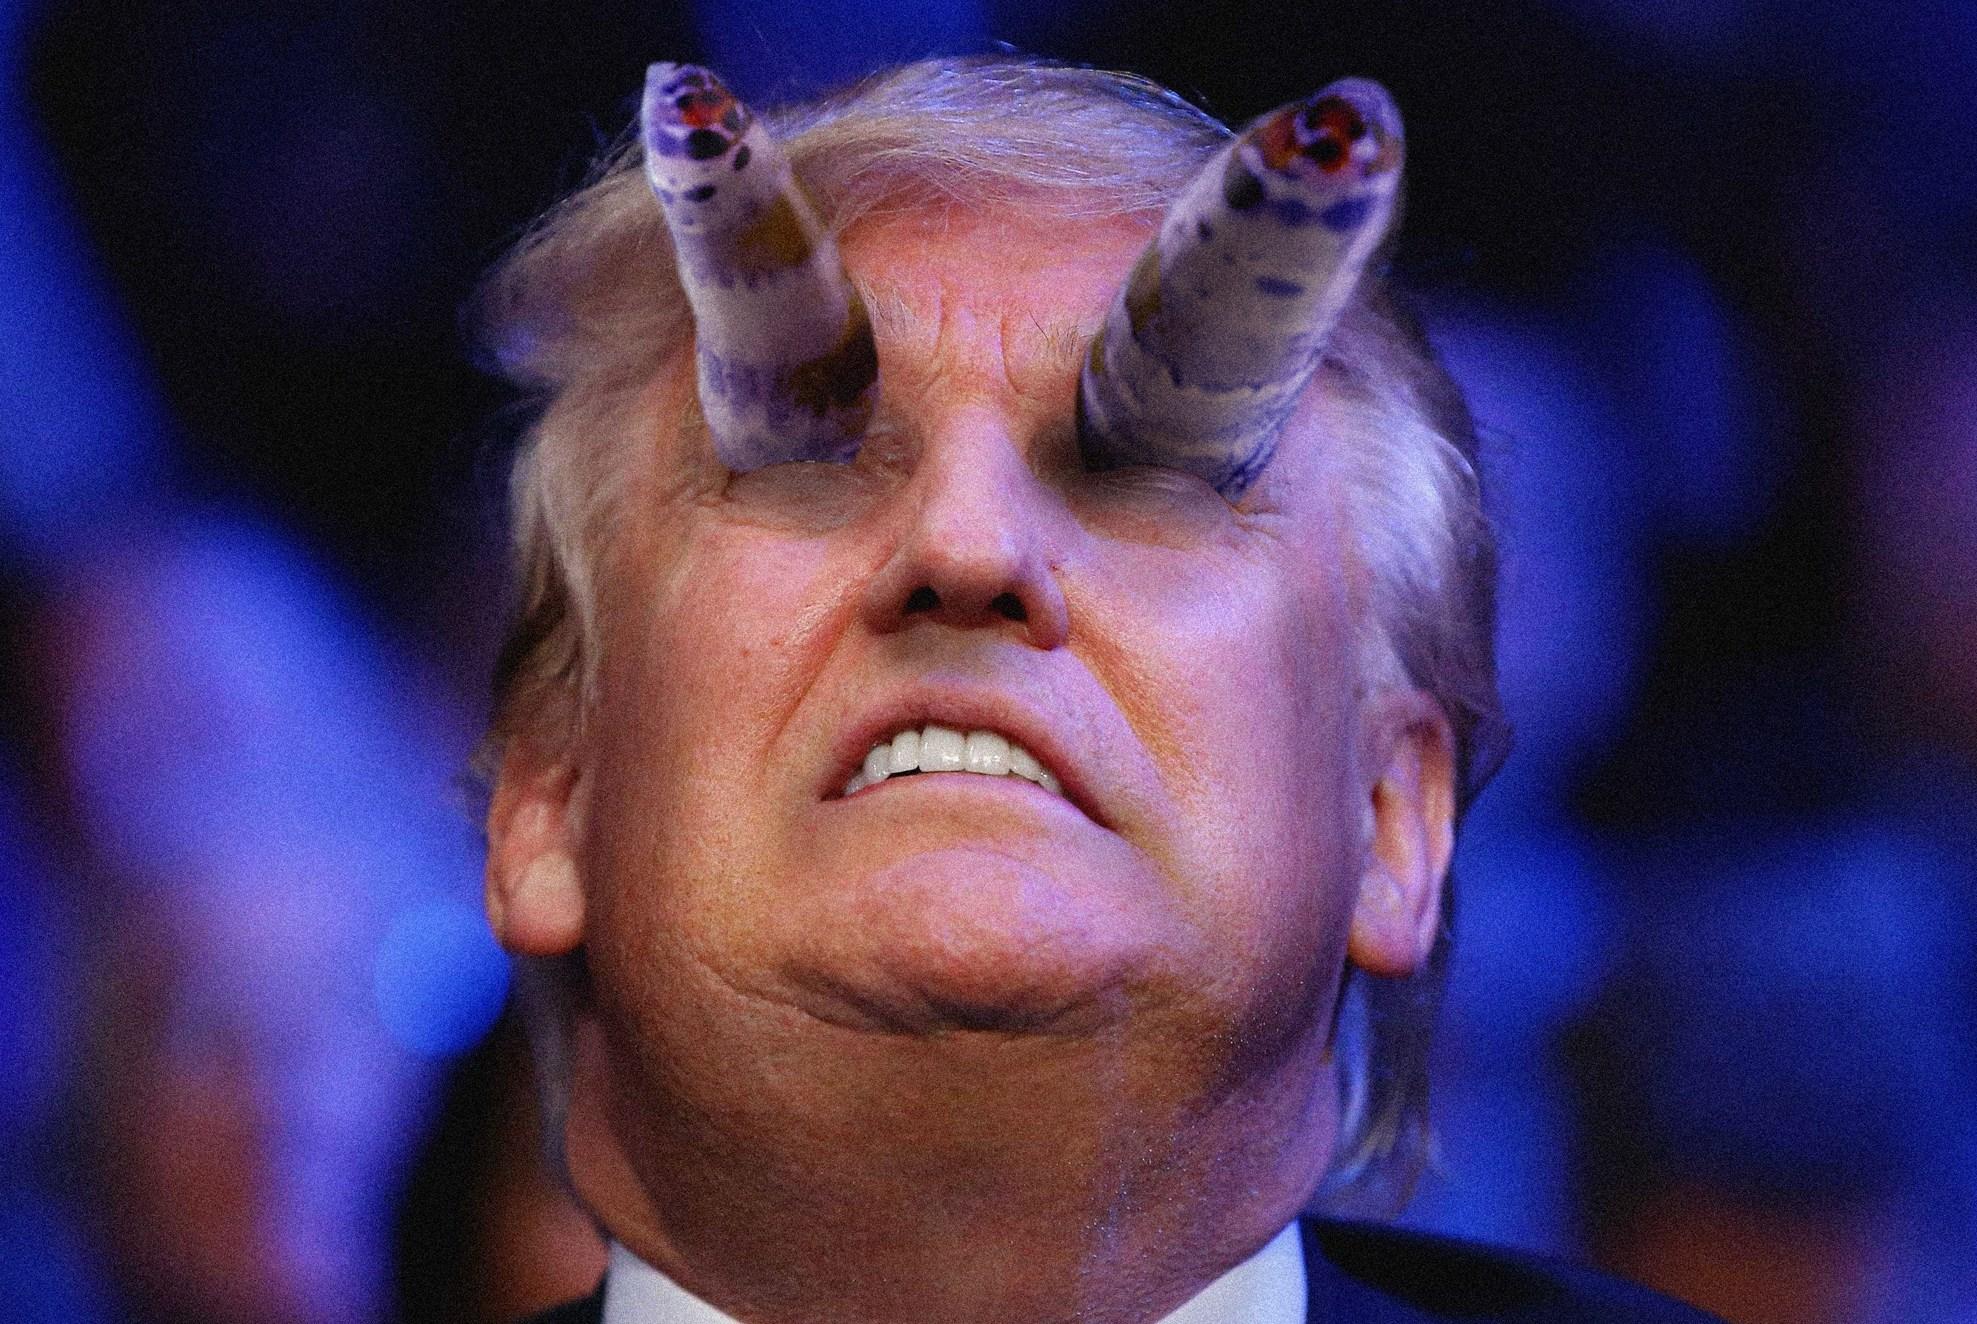 Pentagon: No Trump military parade after all